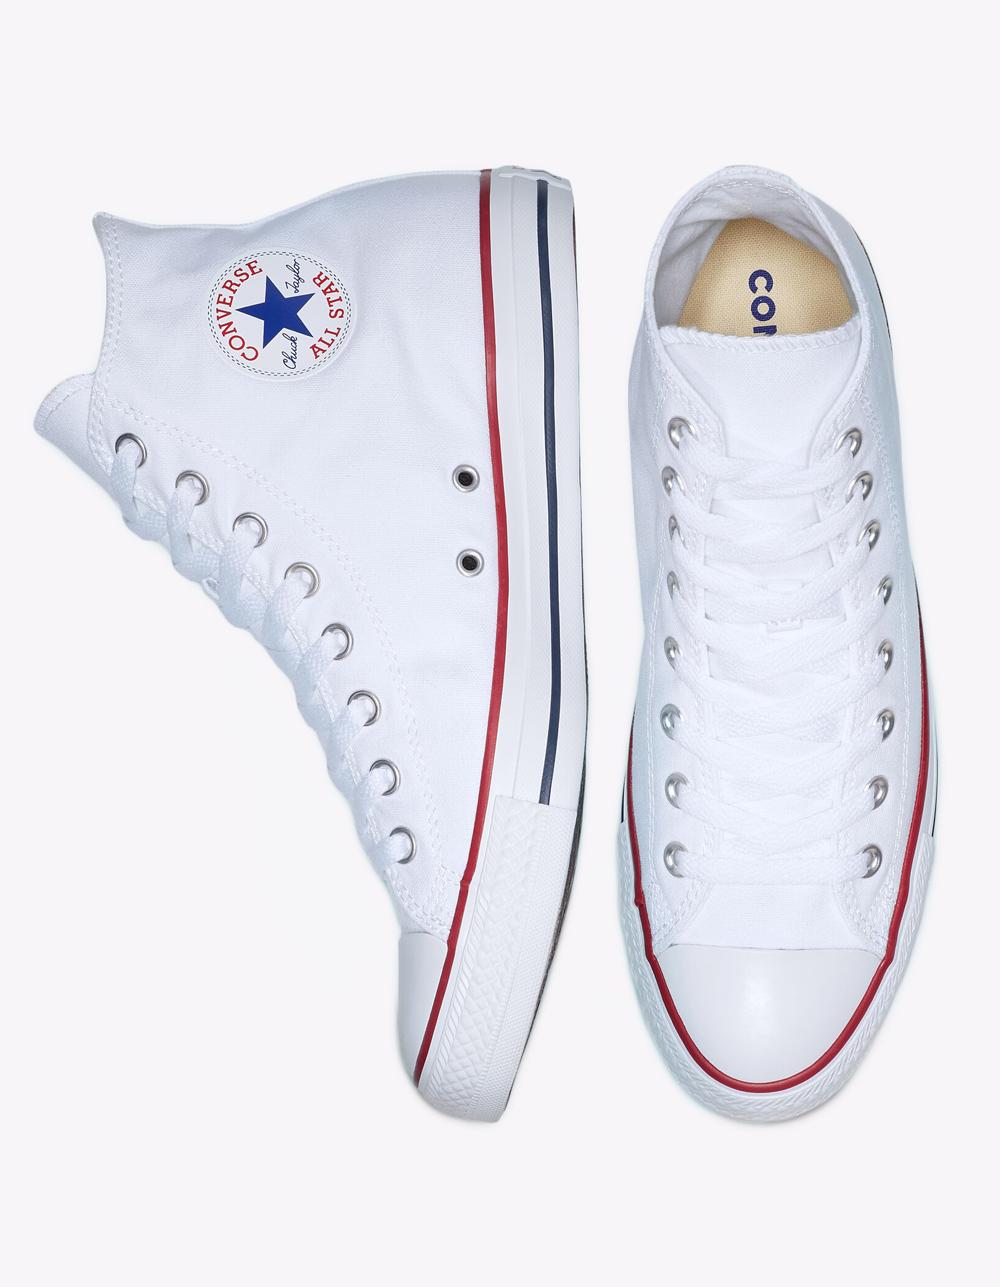 CONVERSE Chuck Taylor All Star Hi Shoes